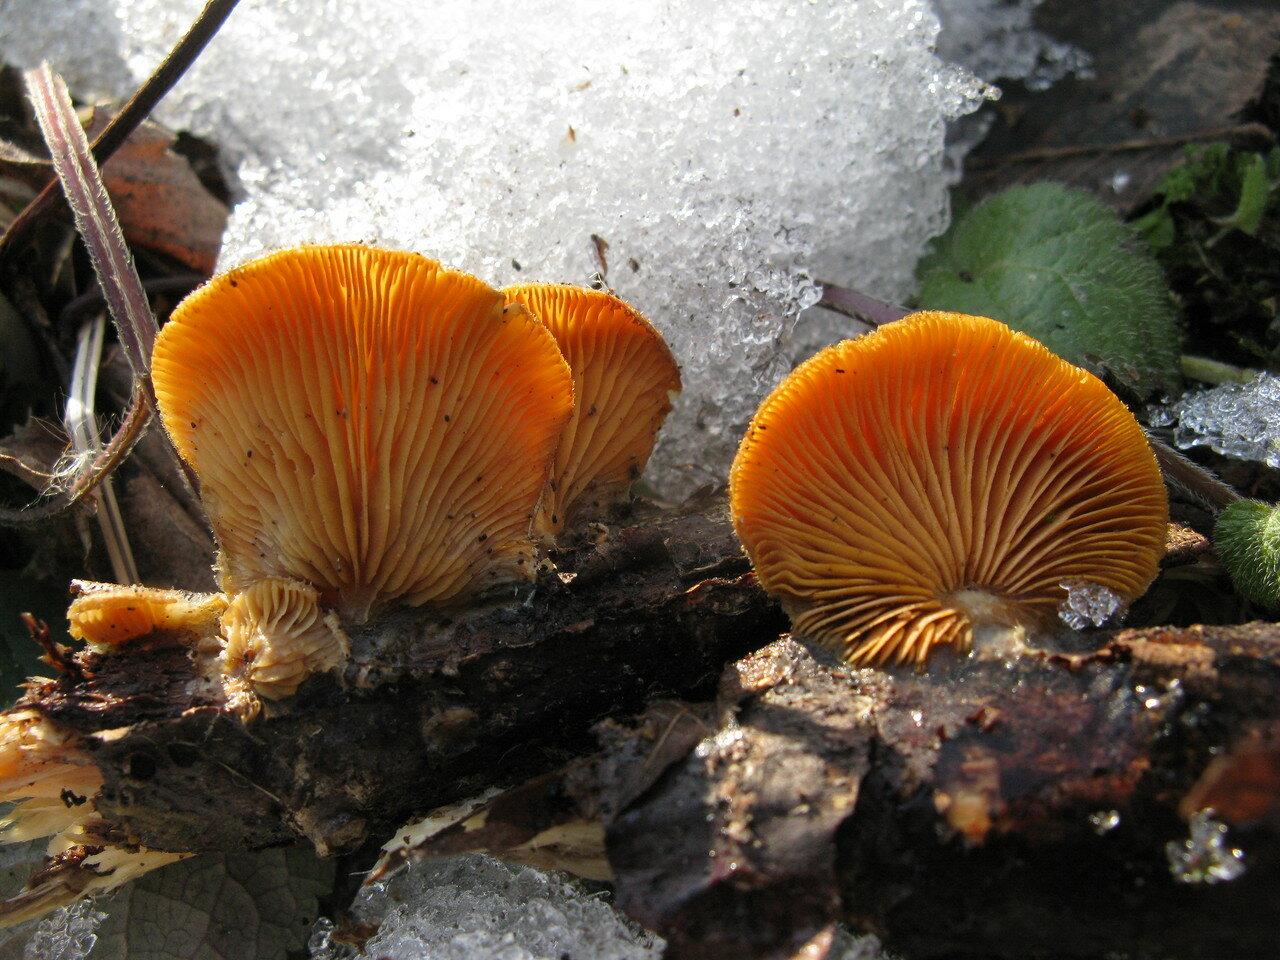 Вешенка <span class=wiki>оранжевая</span> (Phyllotopsis nidulans). Автор фото:Станислав Кривошеев